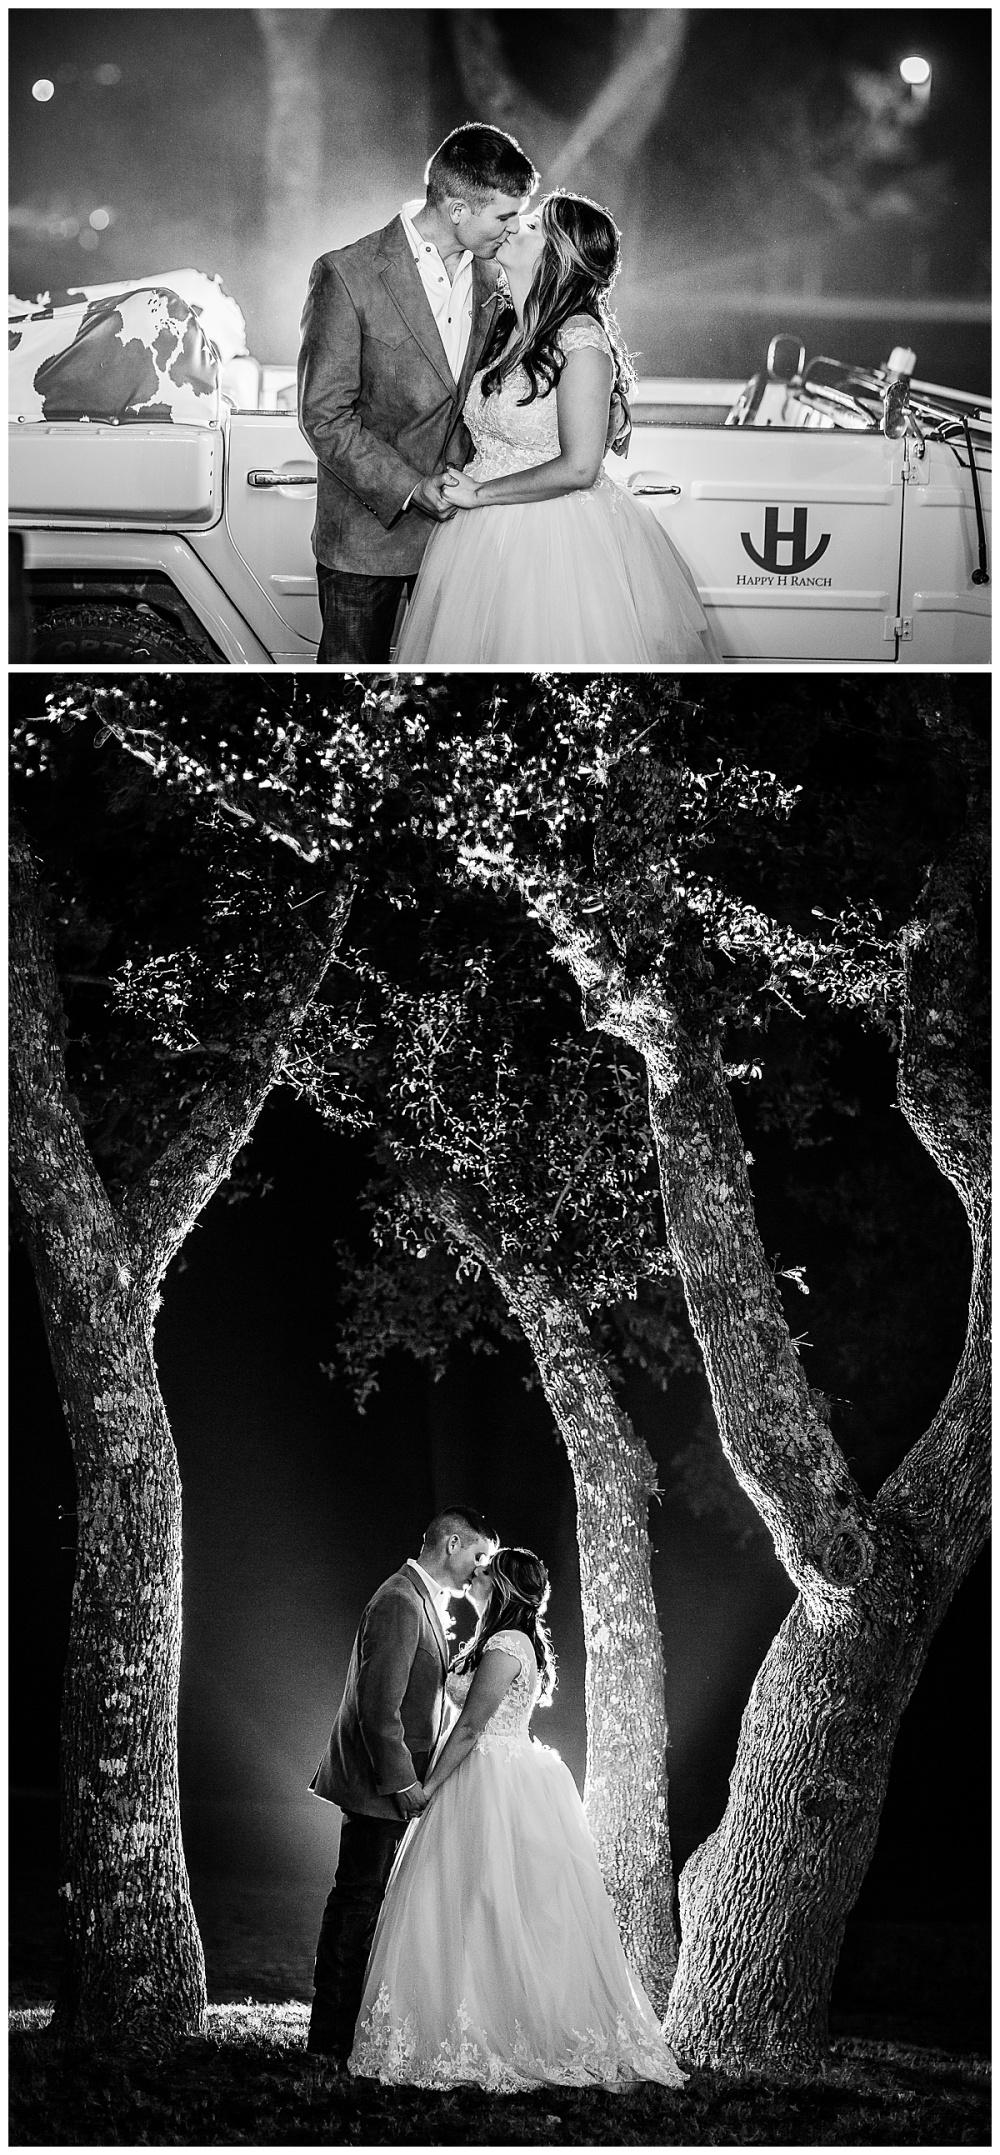 Wedding-Photographer-Texas-Hill-Country-Happy-H-Ranch-Comfor-Texas-Carly-Barton-Photography_0053.jpg